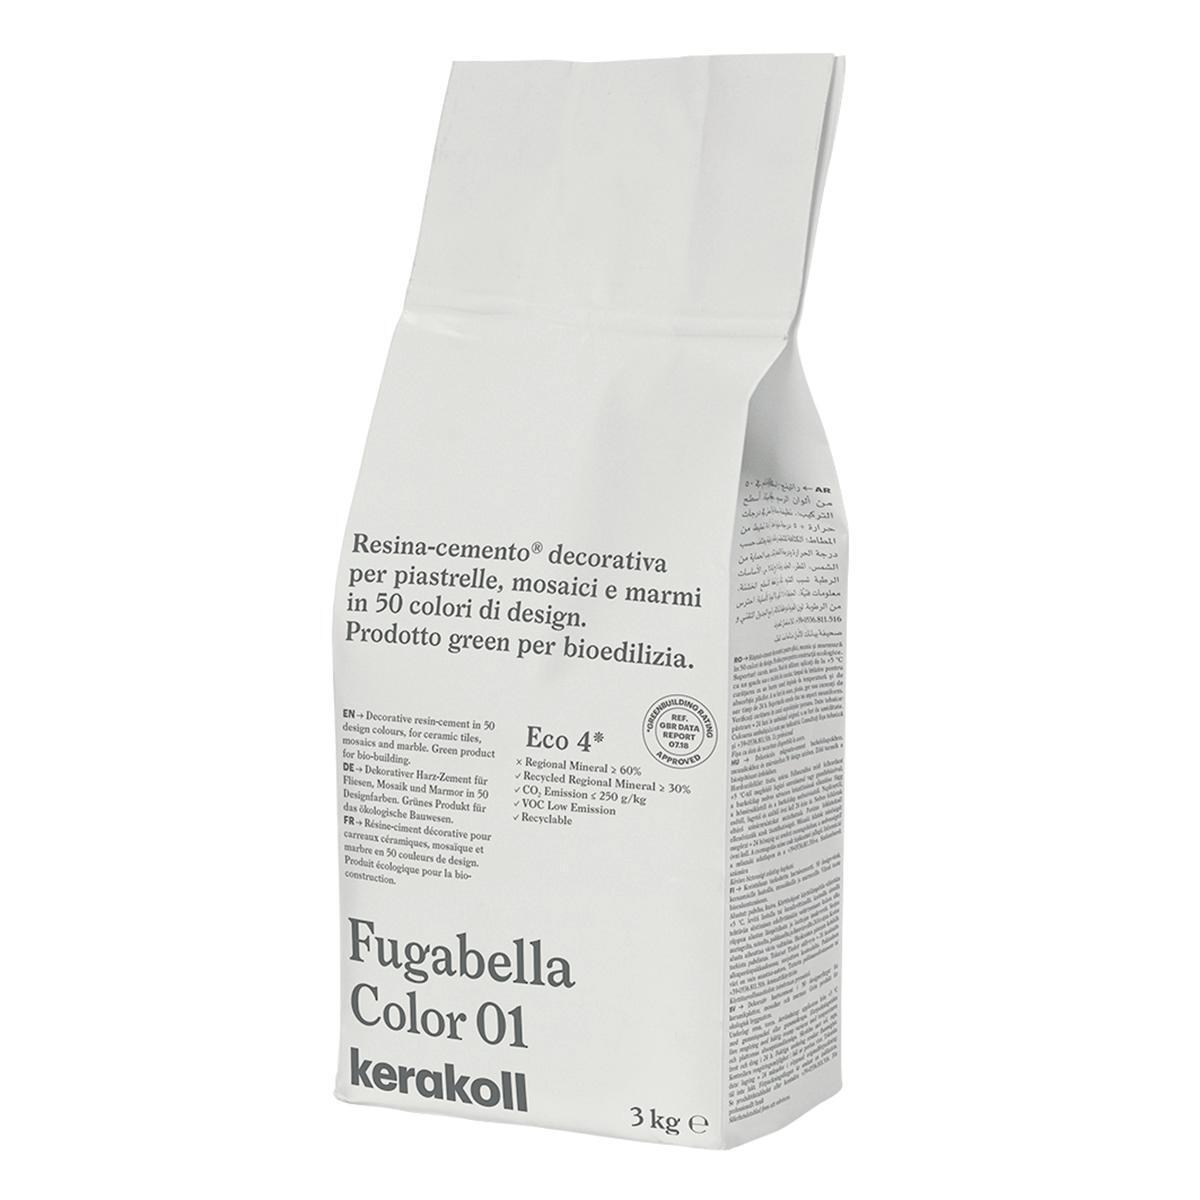 Stucco in polvere FUGABELLA COLOR KERAKOLL 3 kg bianco - 2